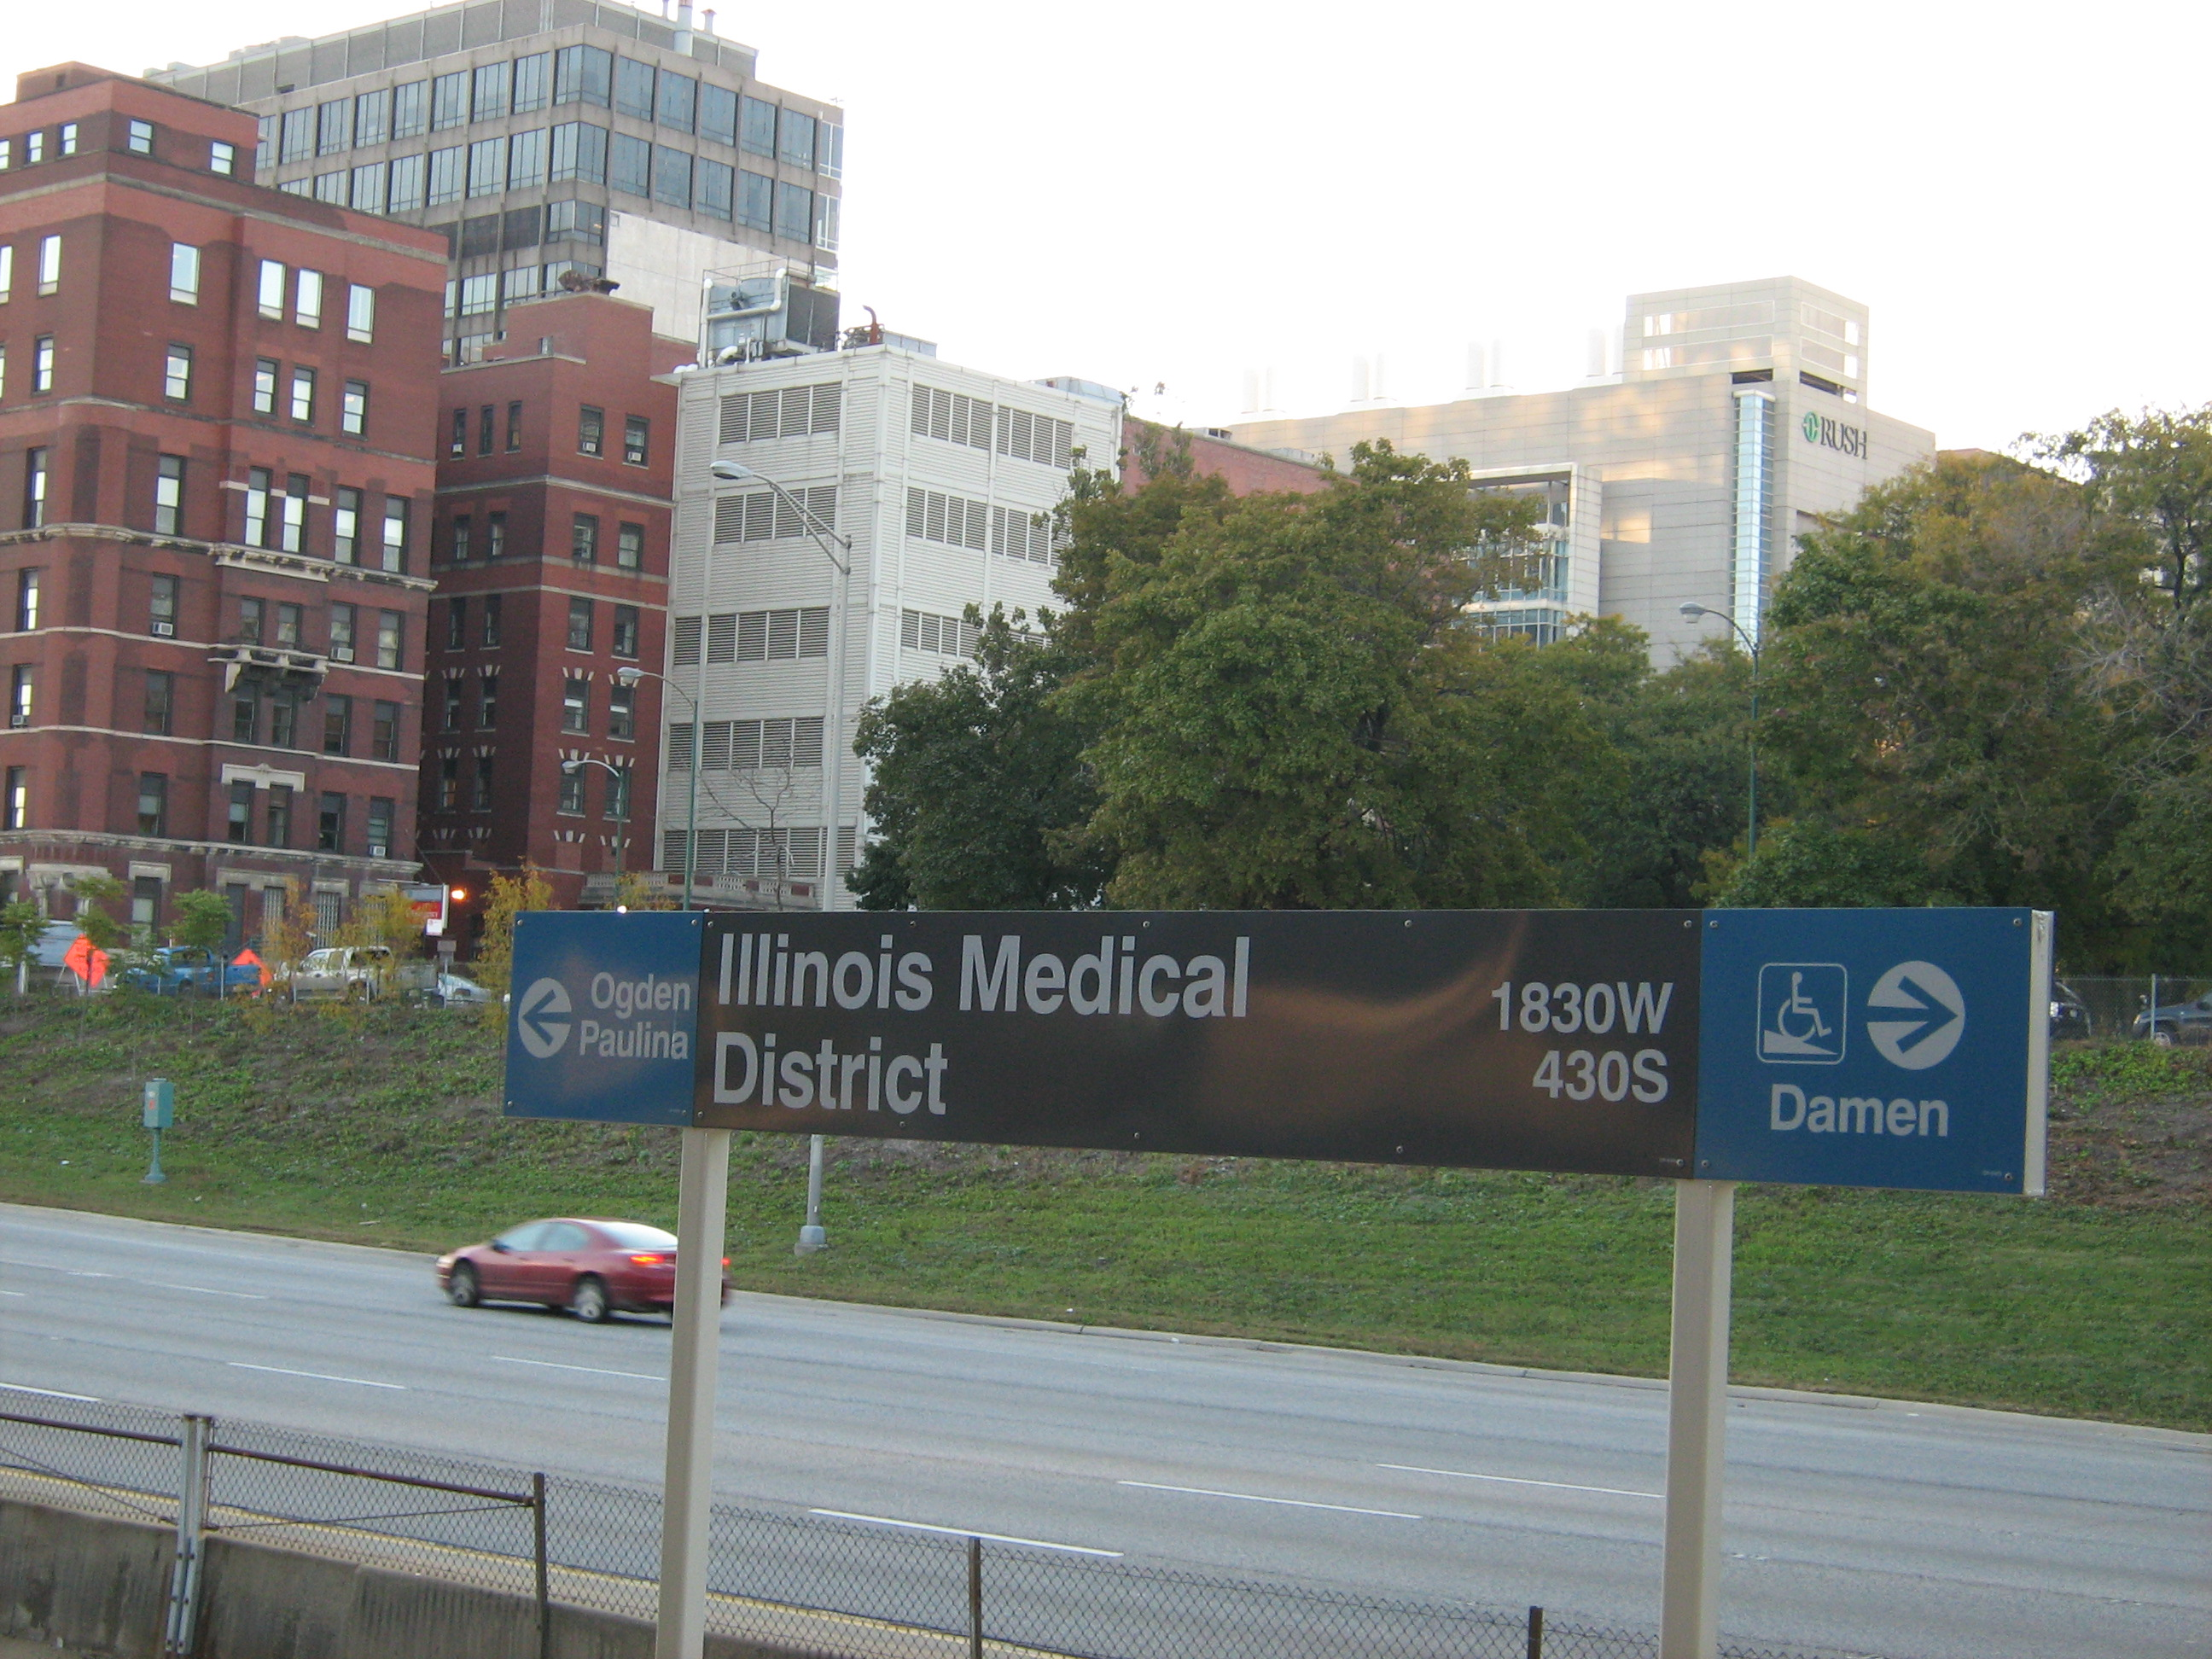 Illinois Medical District (CTA station)